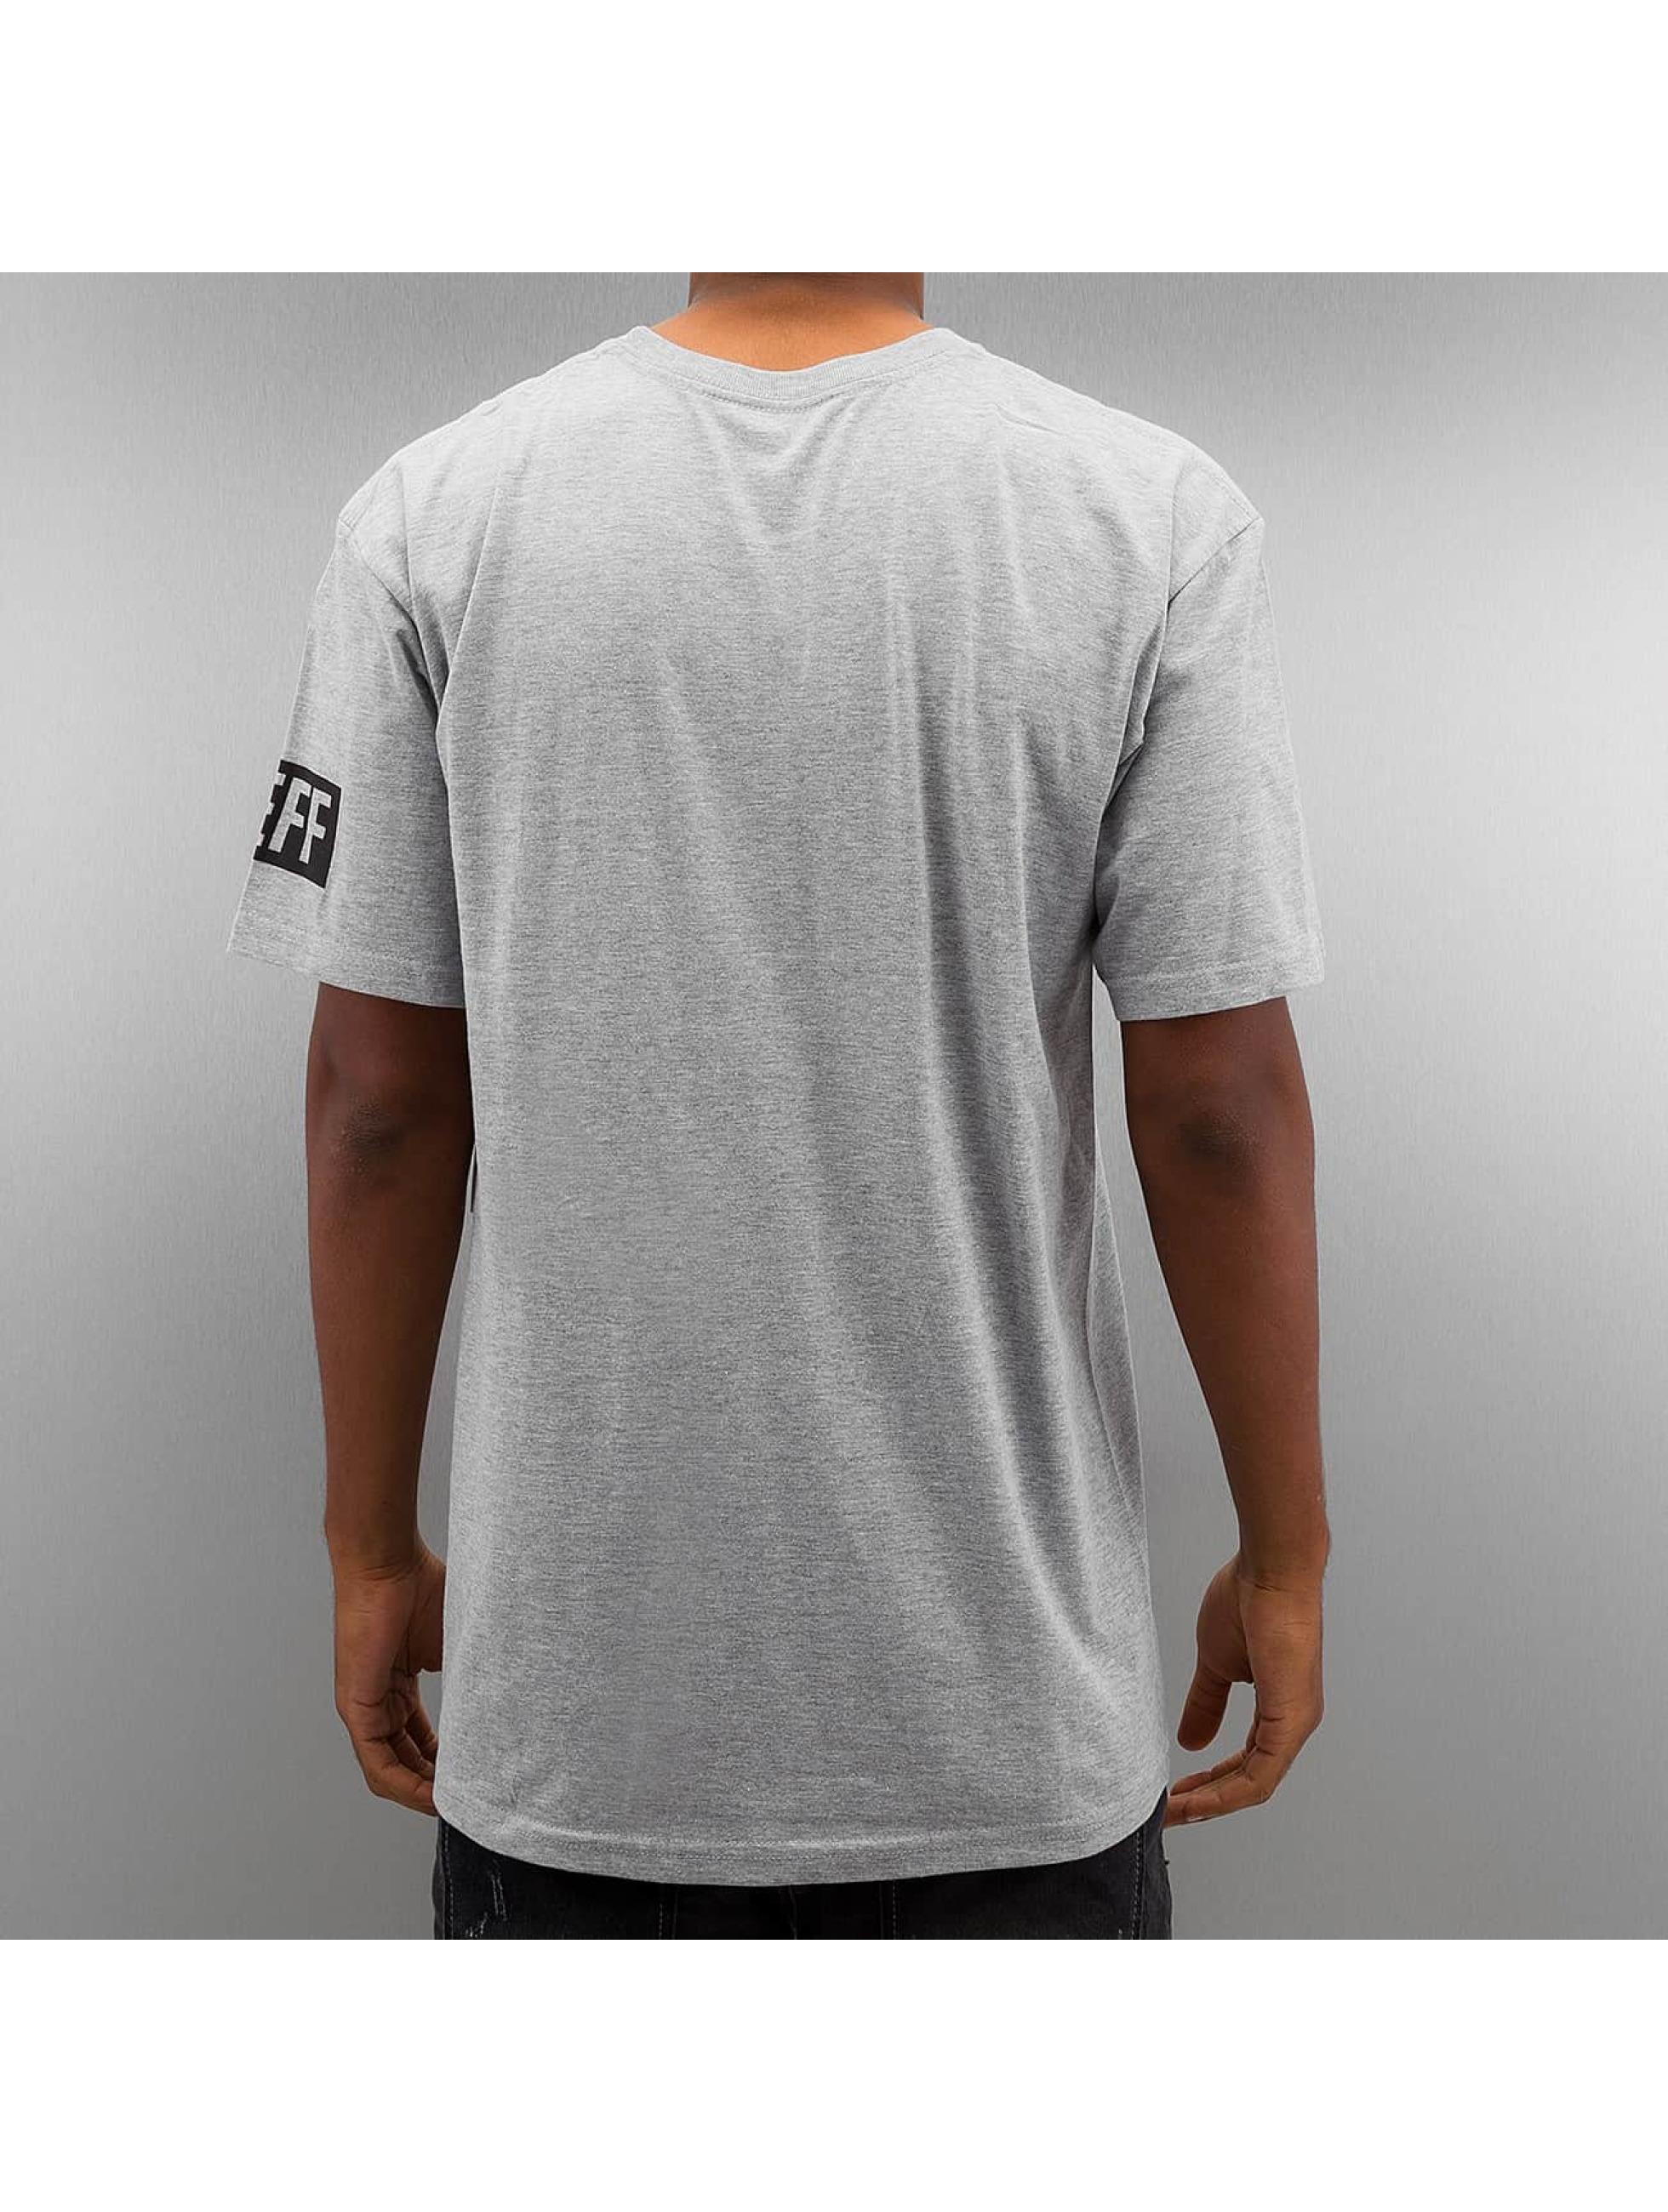 NEFF T-Shirt Camo is Dead grey